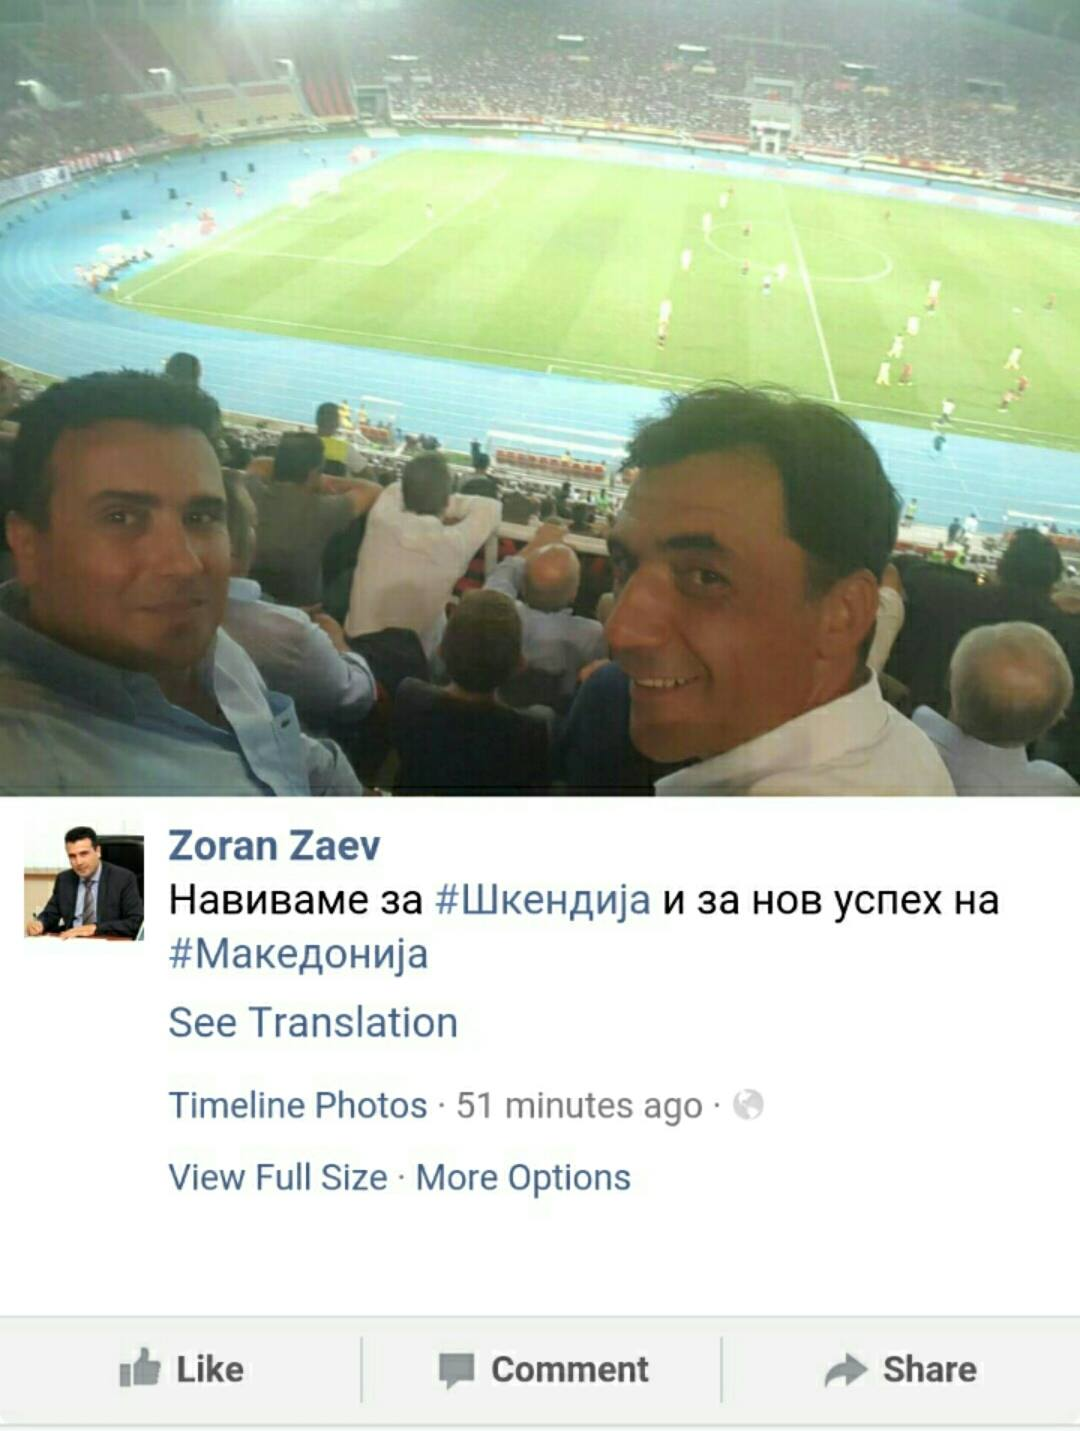 Вардар европски шампион во ракомет Zaev_skendija1